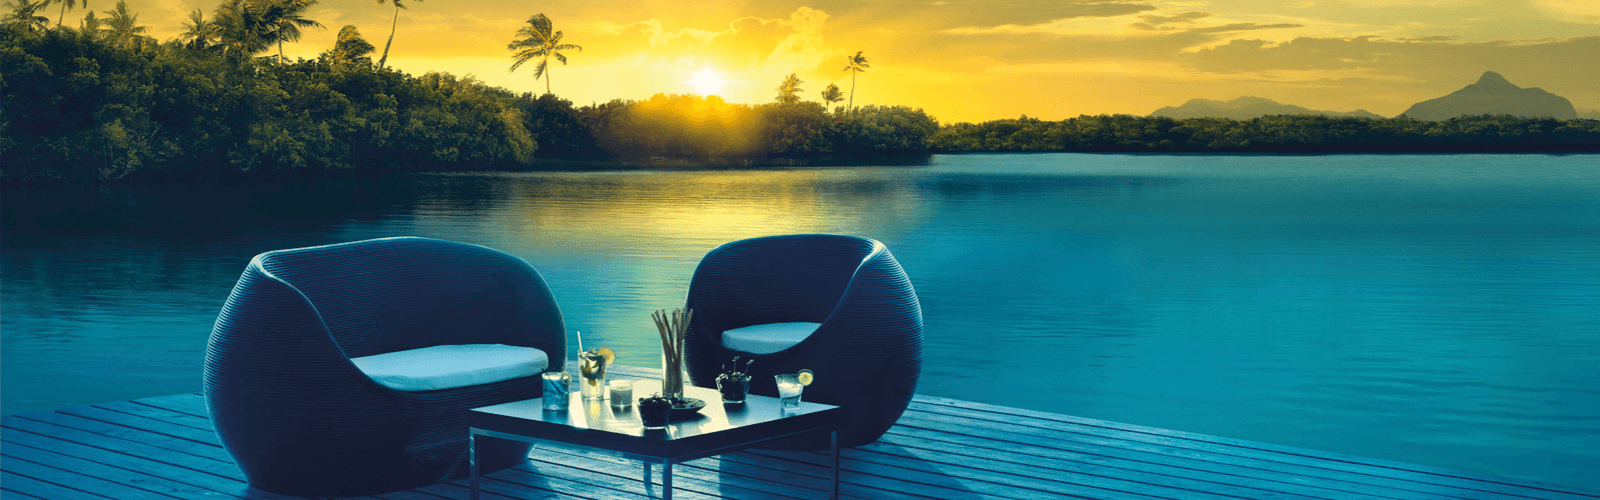 Enjoy your Caribbean Mojito